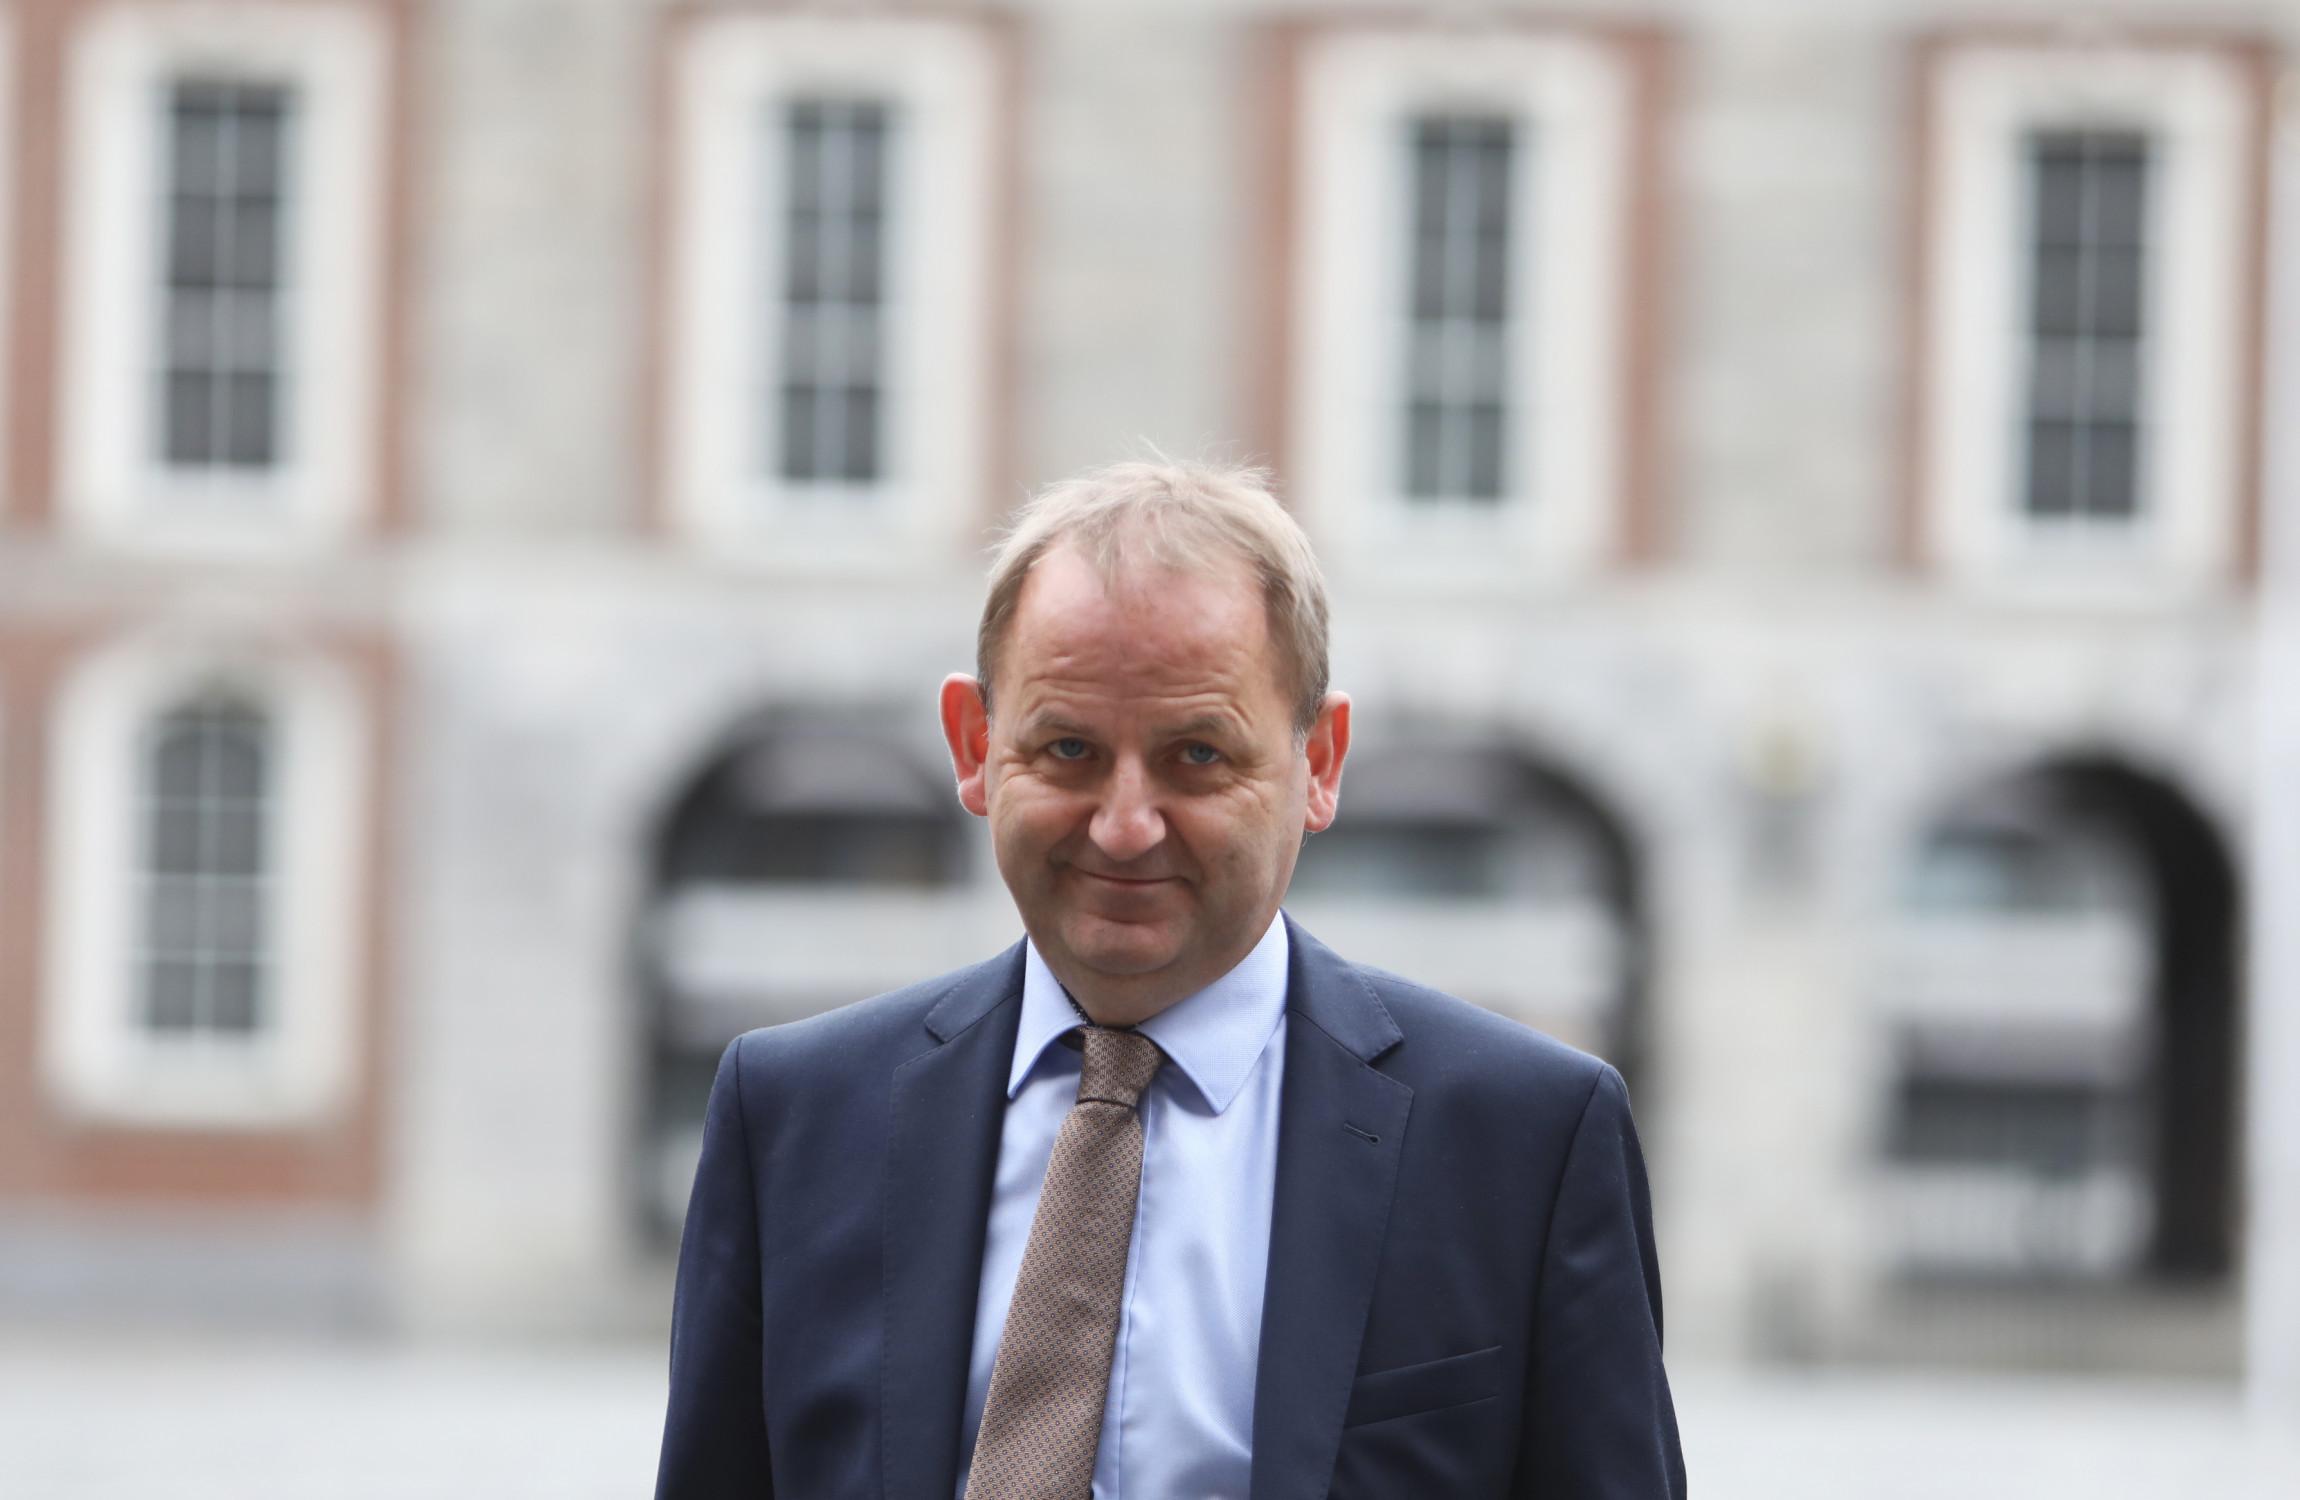 Senior Garda denies making allegation about whistleblower Maurice McCabe